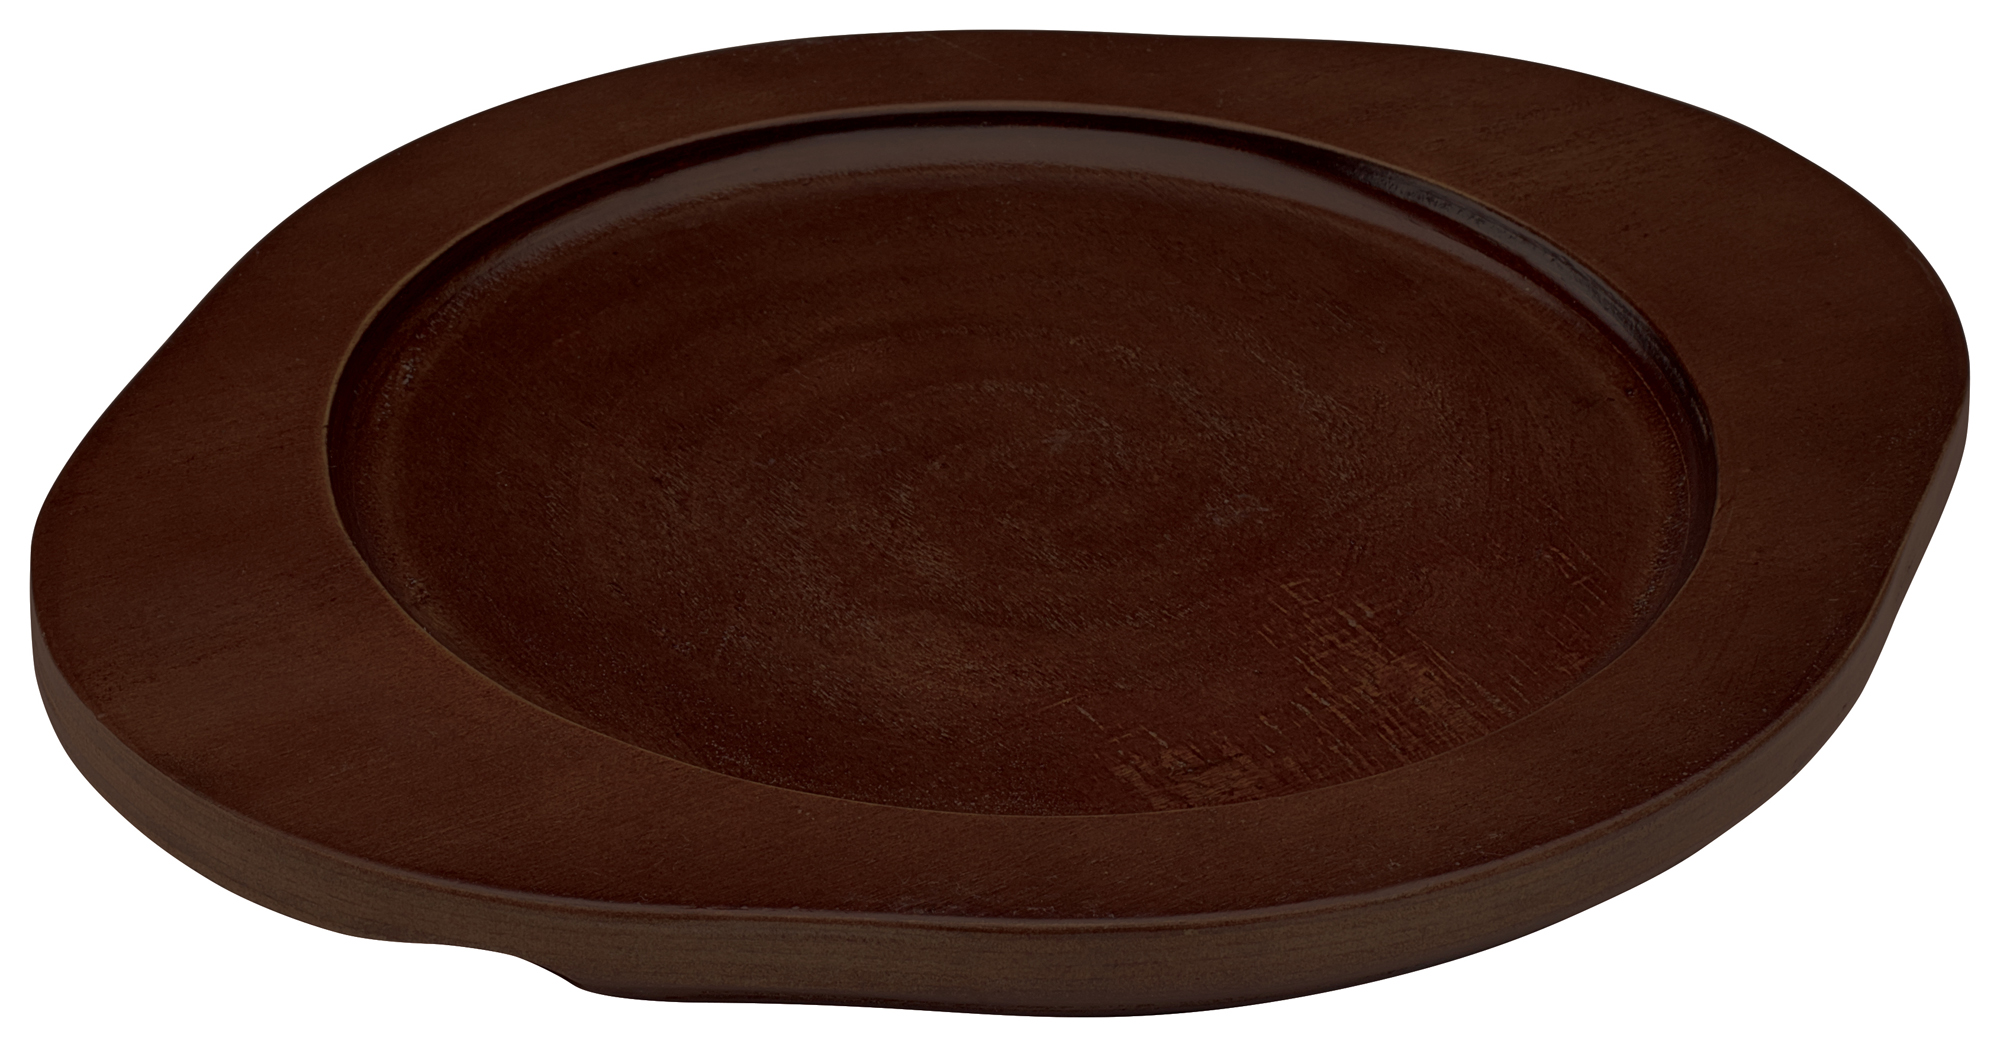 Winco CAST-8UL wood underliner